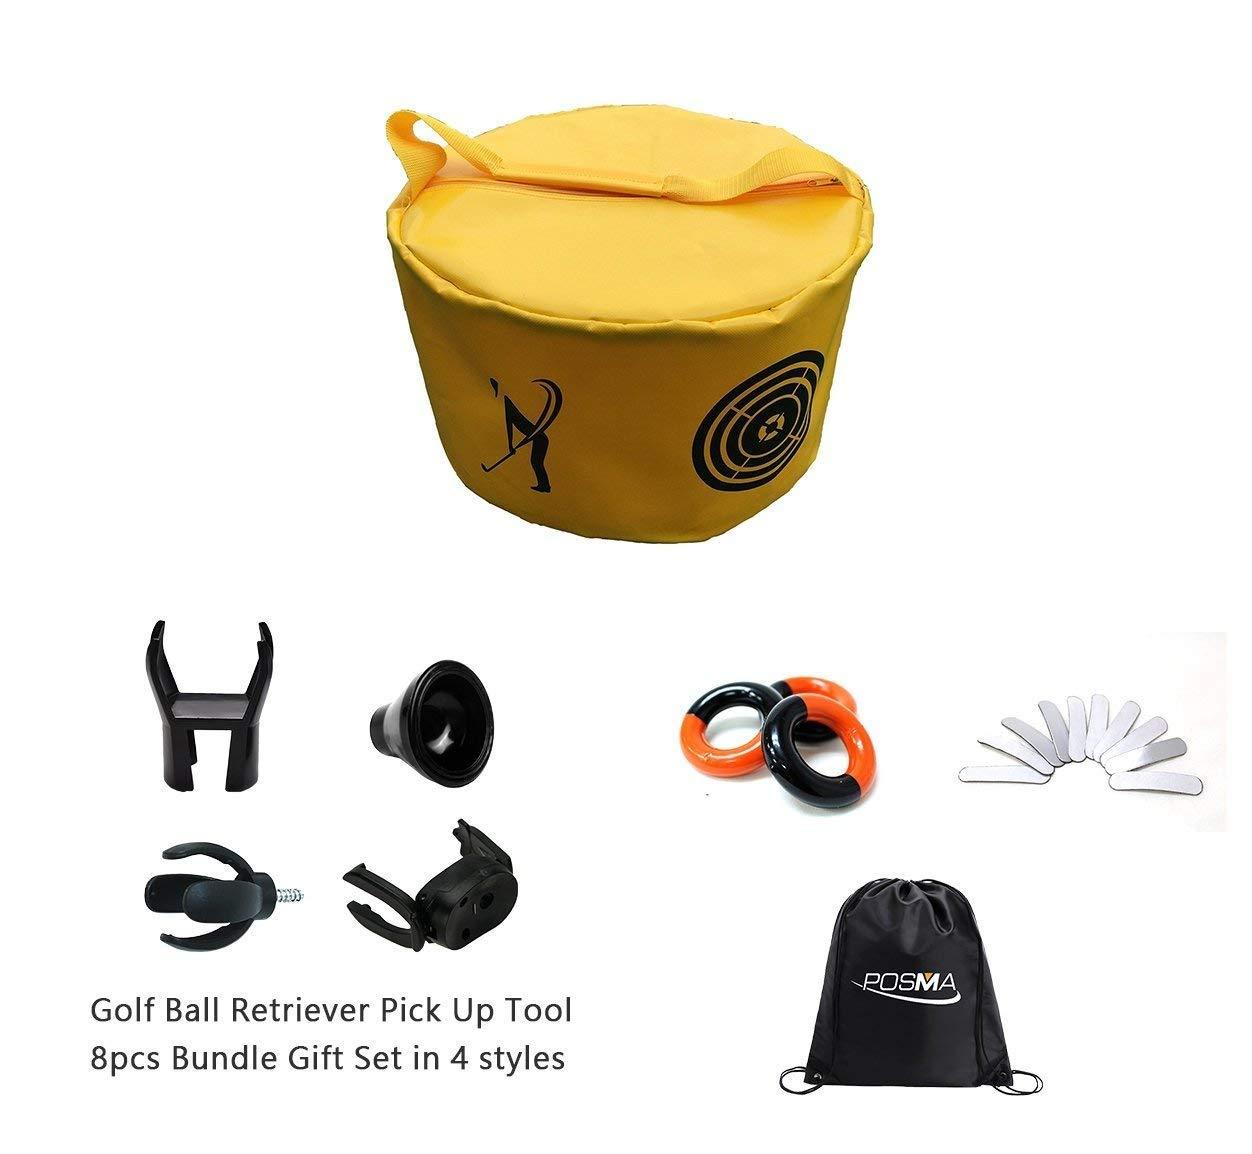 POSMA HB010C Golf Hitting Bag Swing Impcat Power Smach Bag Training Set with Weight Power Swing Ring(3pcs)